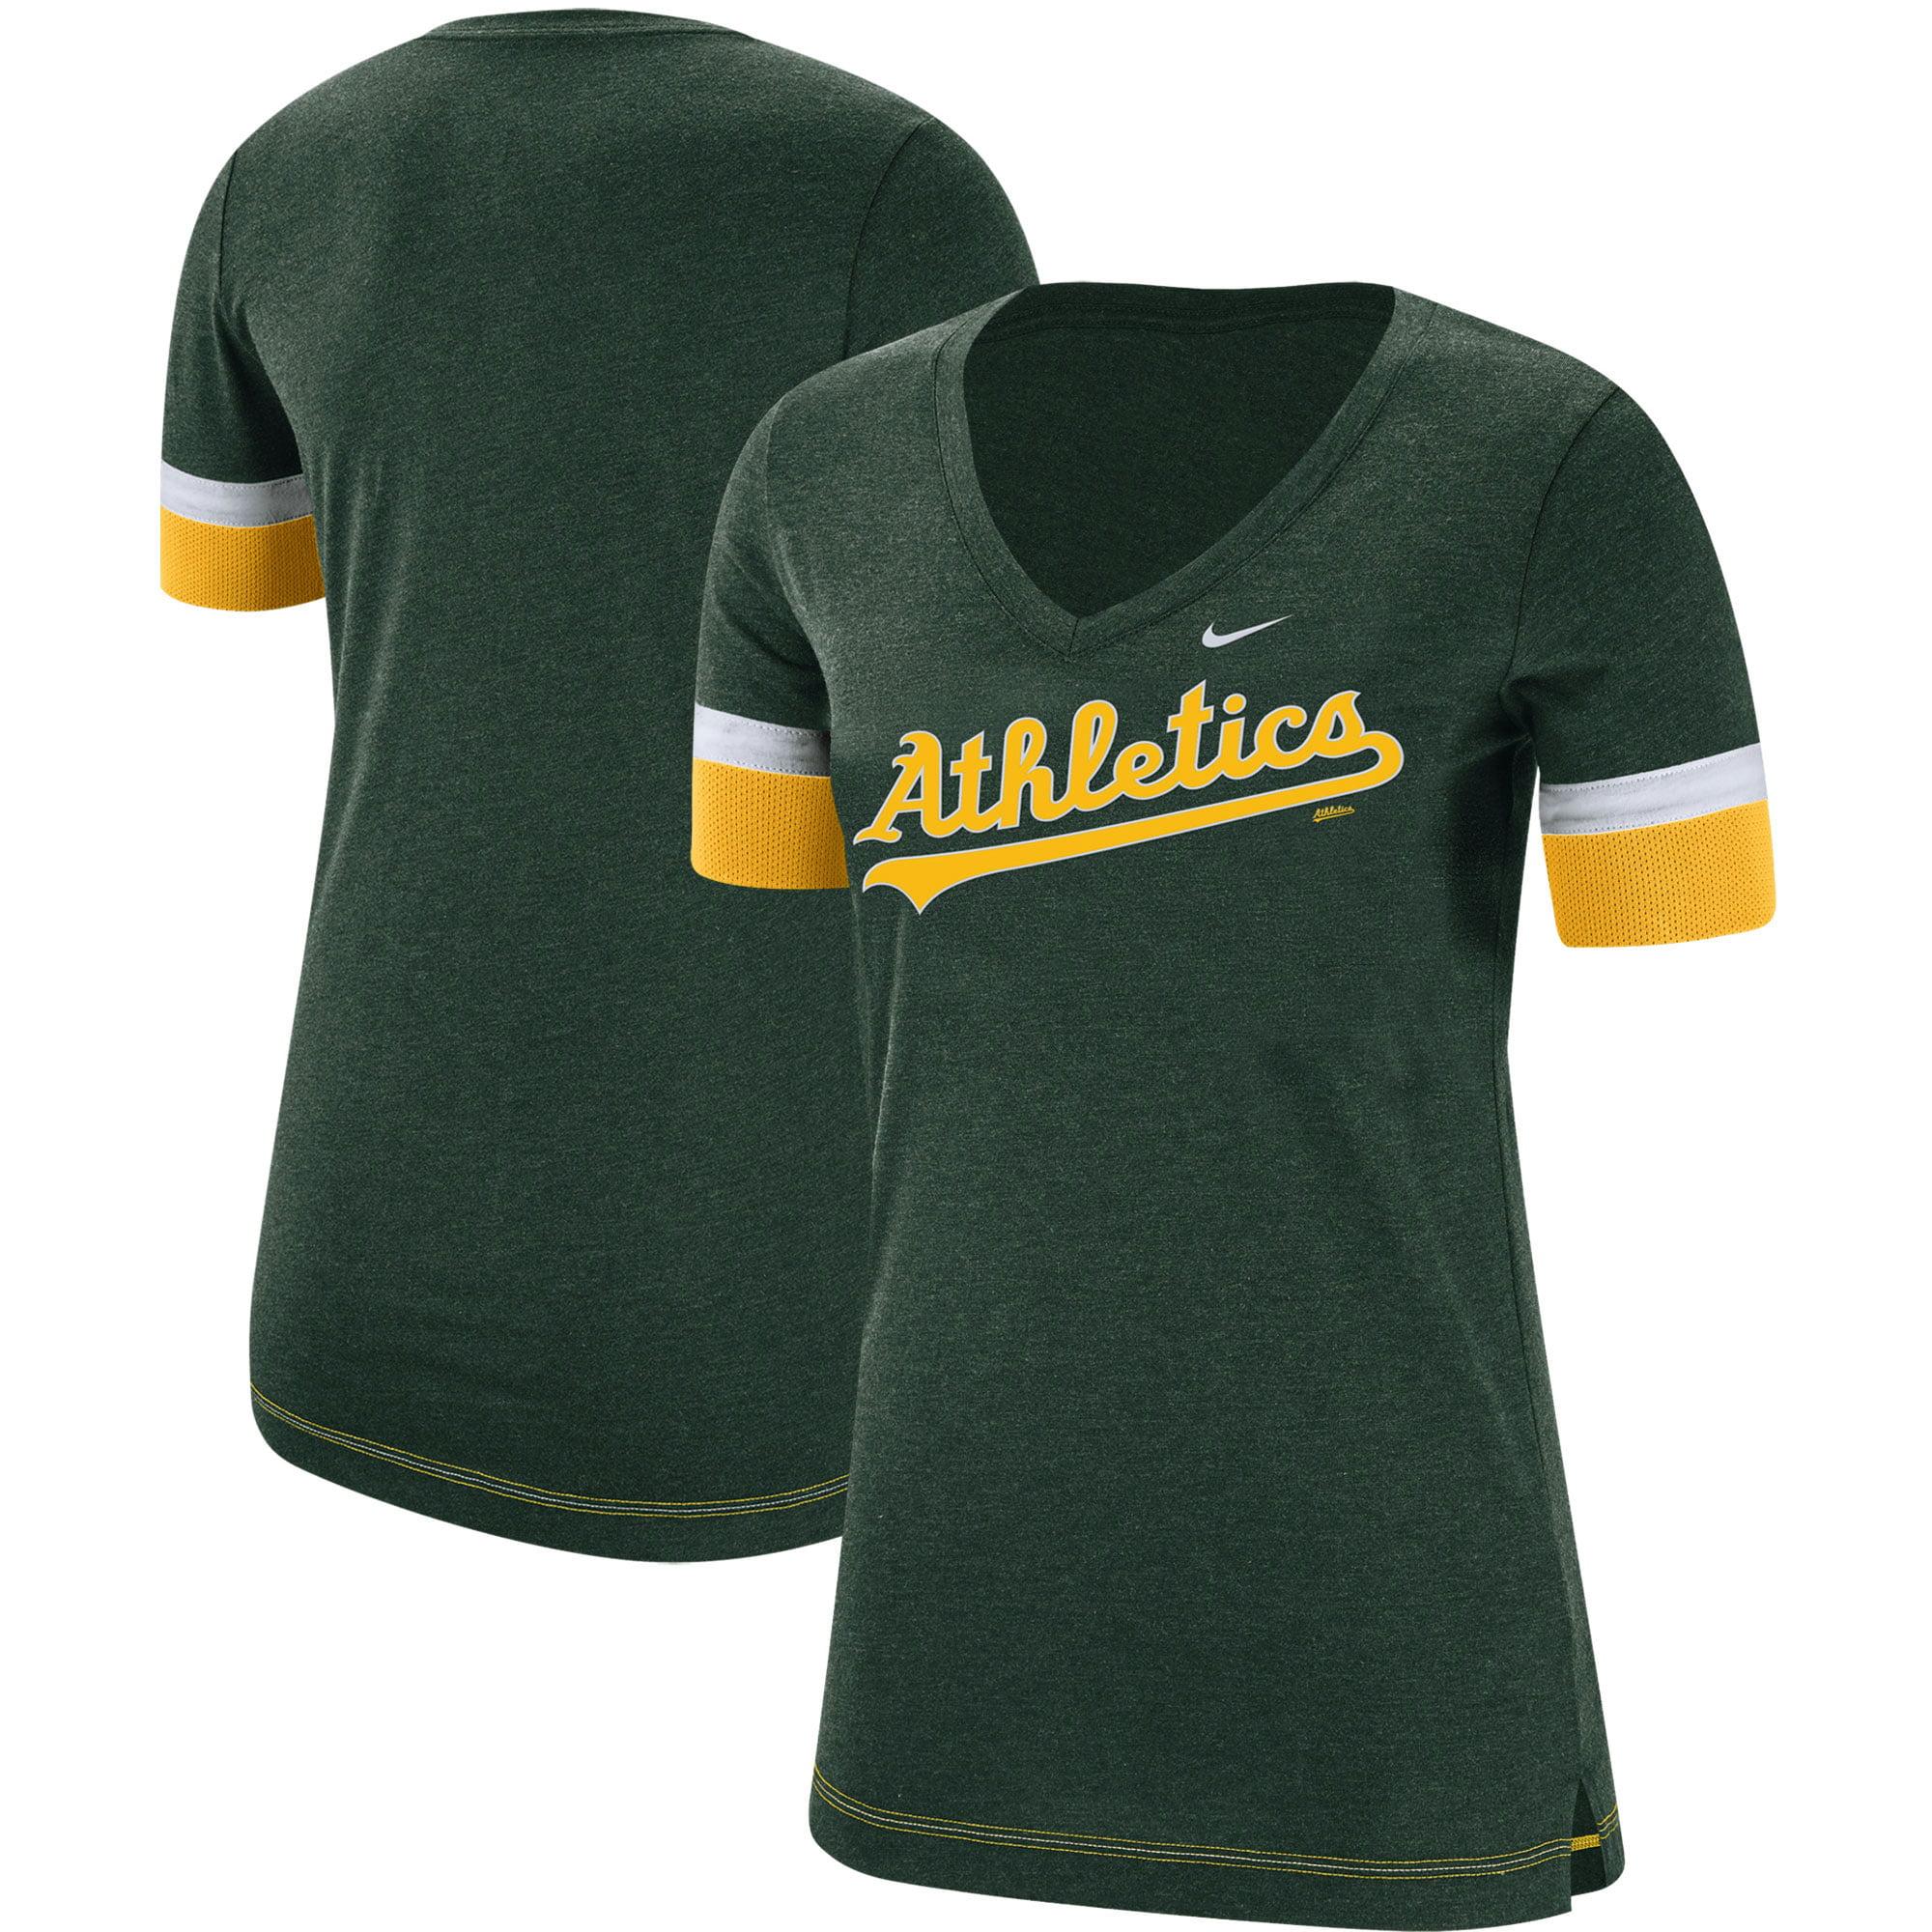 Oakland Athletics Nike Women's Mesh V-Neck T-Shirt - Green